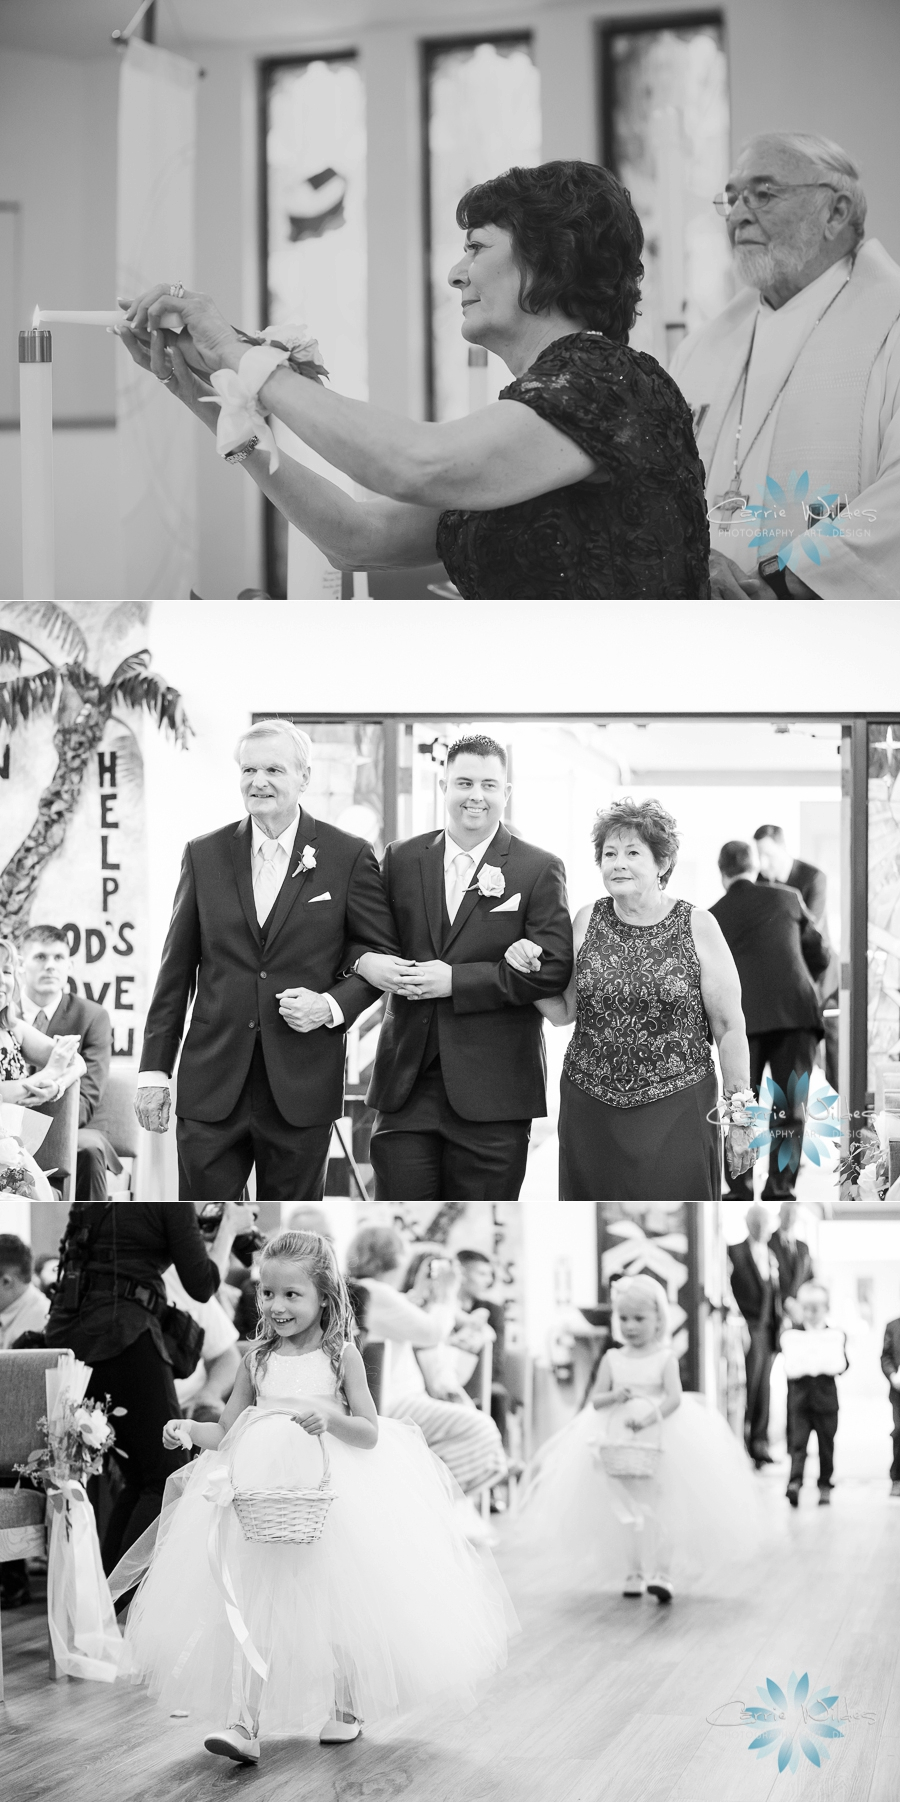 8_4_18 Charlie and Julie Bon Apetit Dunedin Wedding_0024.jpg